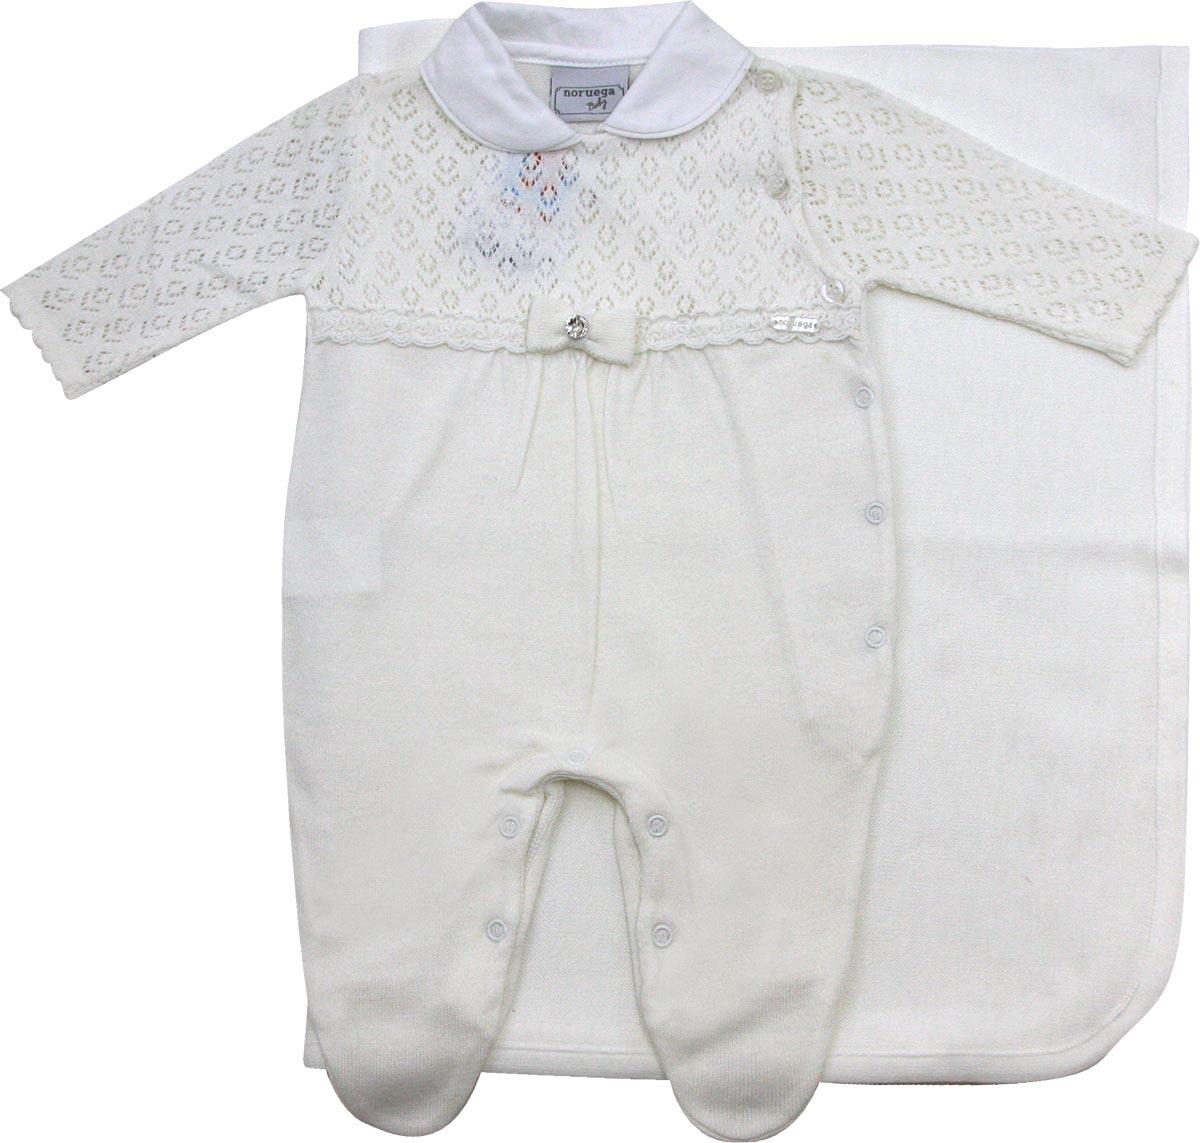 11.792K - Saída Maternidade c/ Ponto Aberto